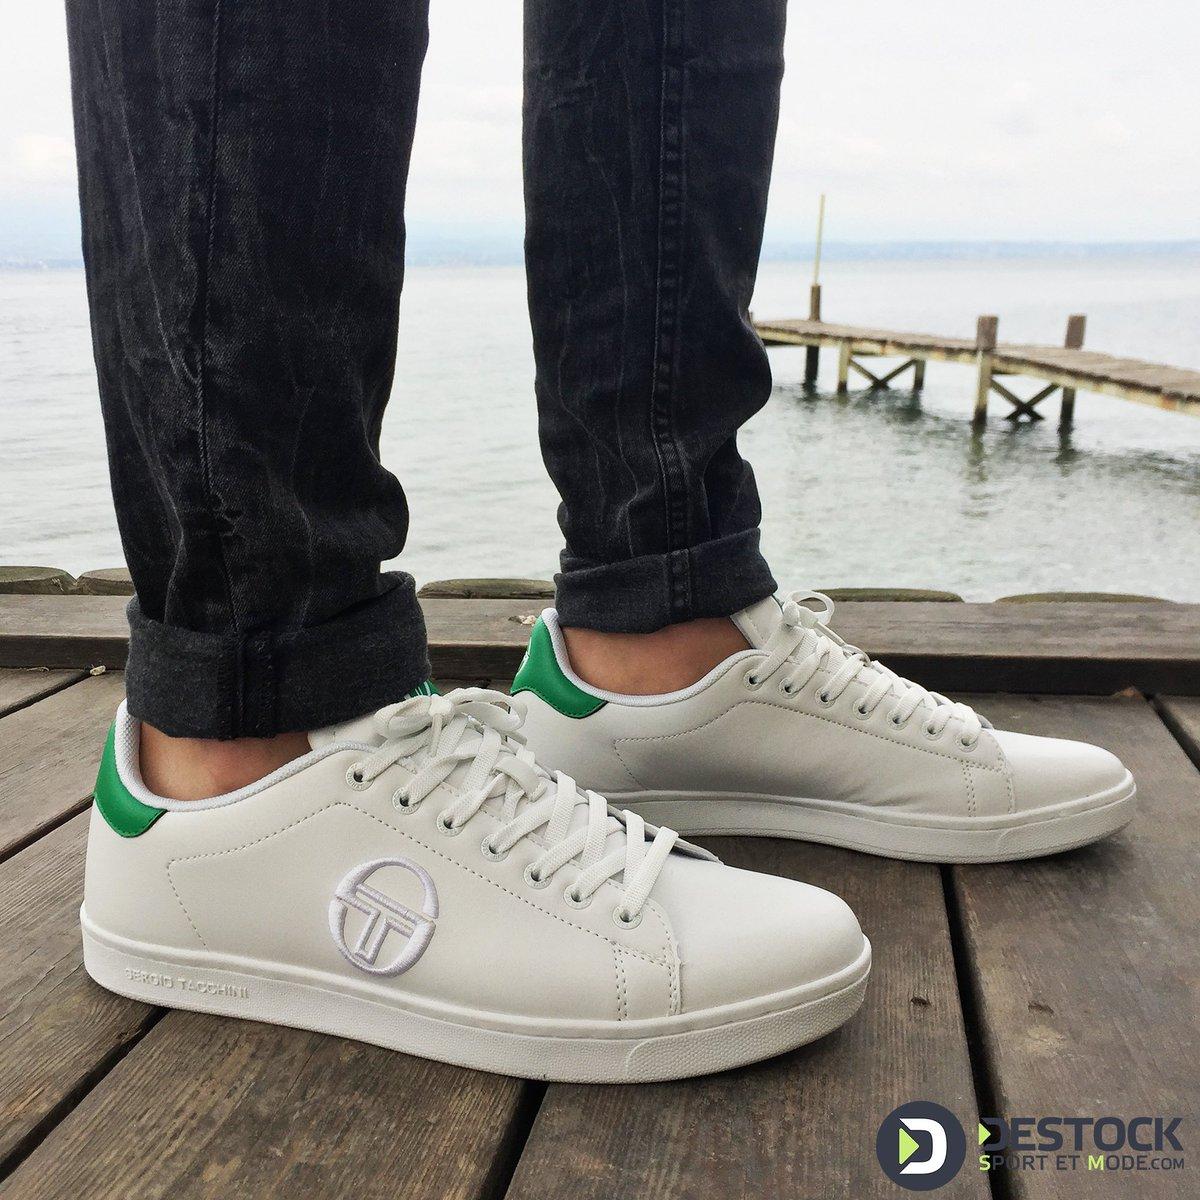 69bdc1404768 Dispo juste ici : https://www.destock-sport-et-mode.com/gran-torino-chaussure-unisexe.html  … #sergiotacchini #soldes #soldes2018pic.twitter.com/ziekaZCUws